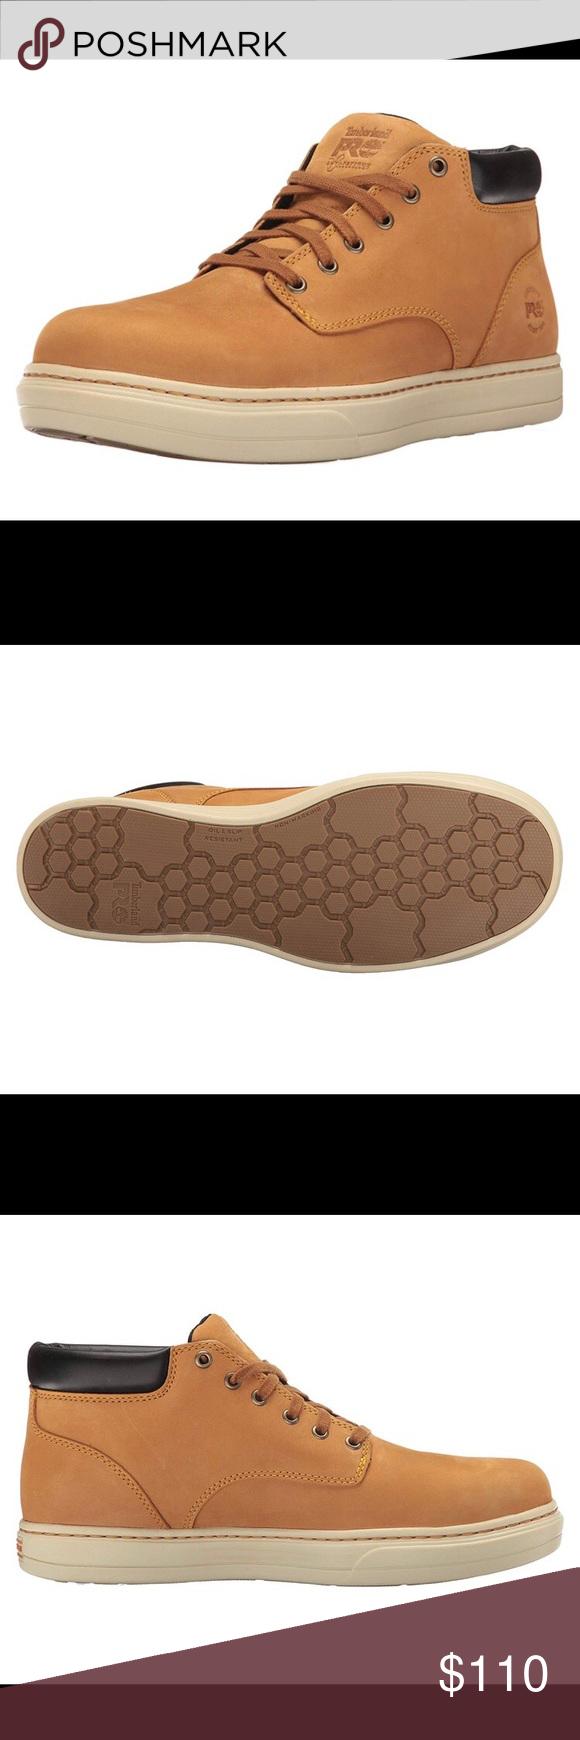 Timberland Pro Distributor Chukka Safety Toe Shoe NWT